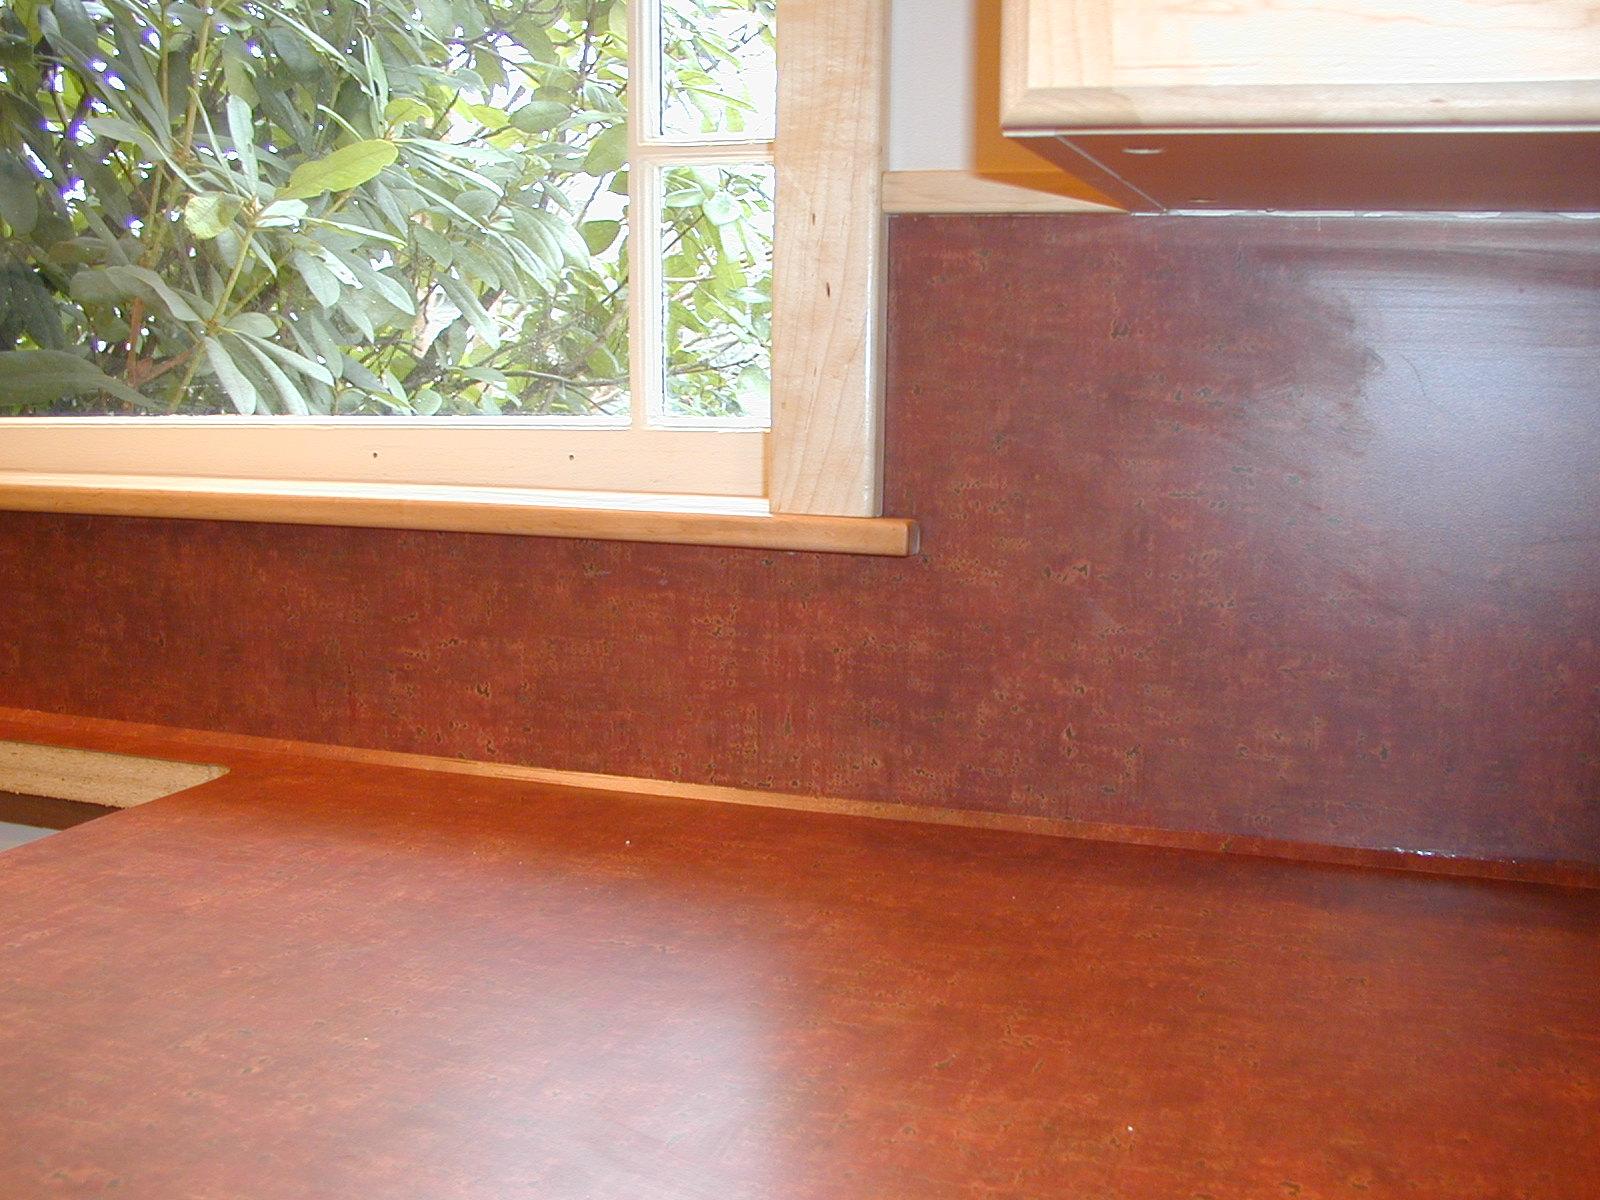 Laminate Countertop Corner Options : countertop design and installation, laminate kitchen countertop ...